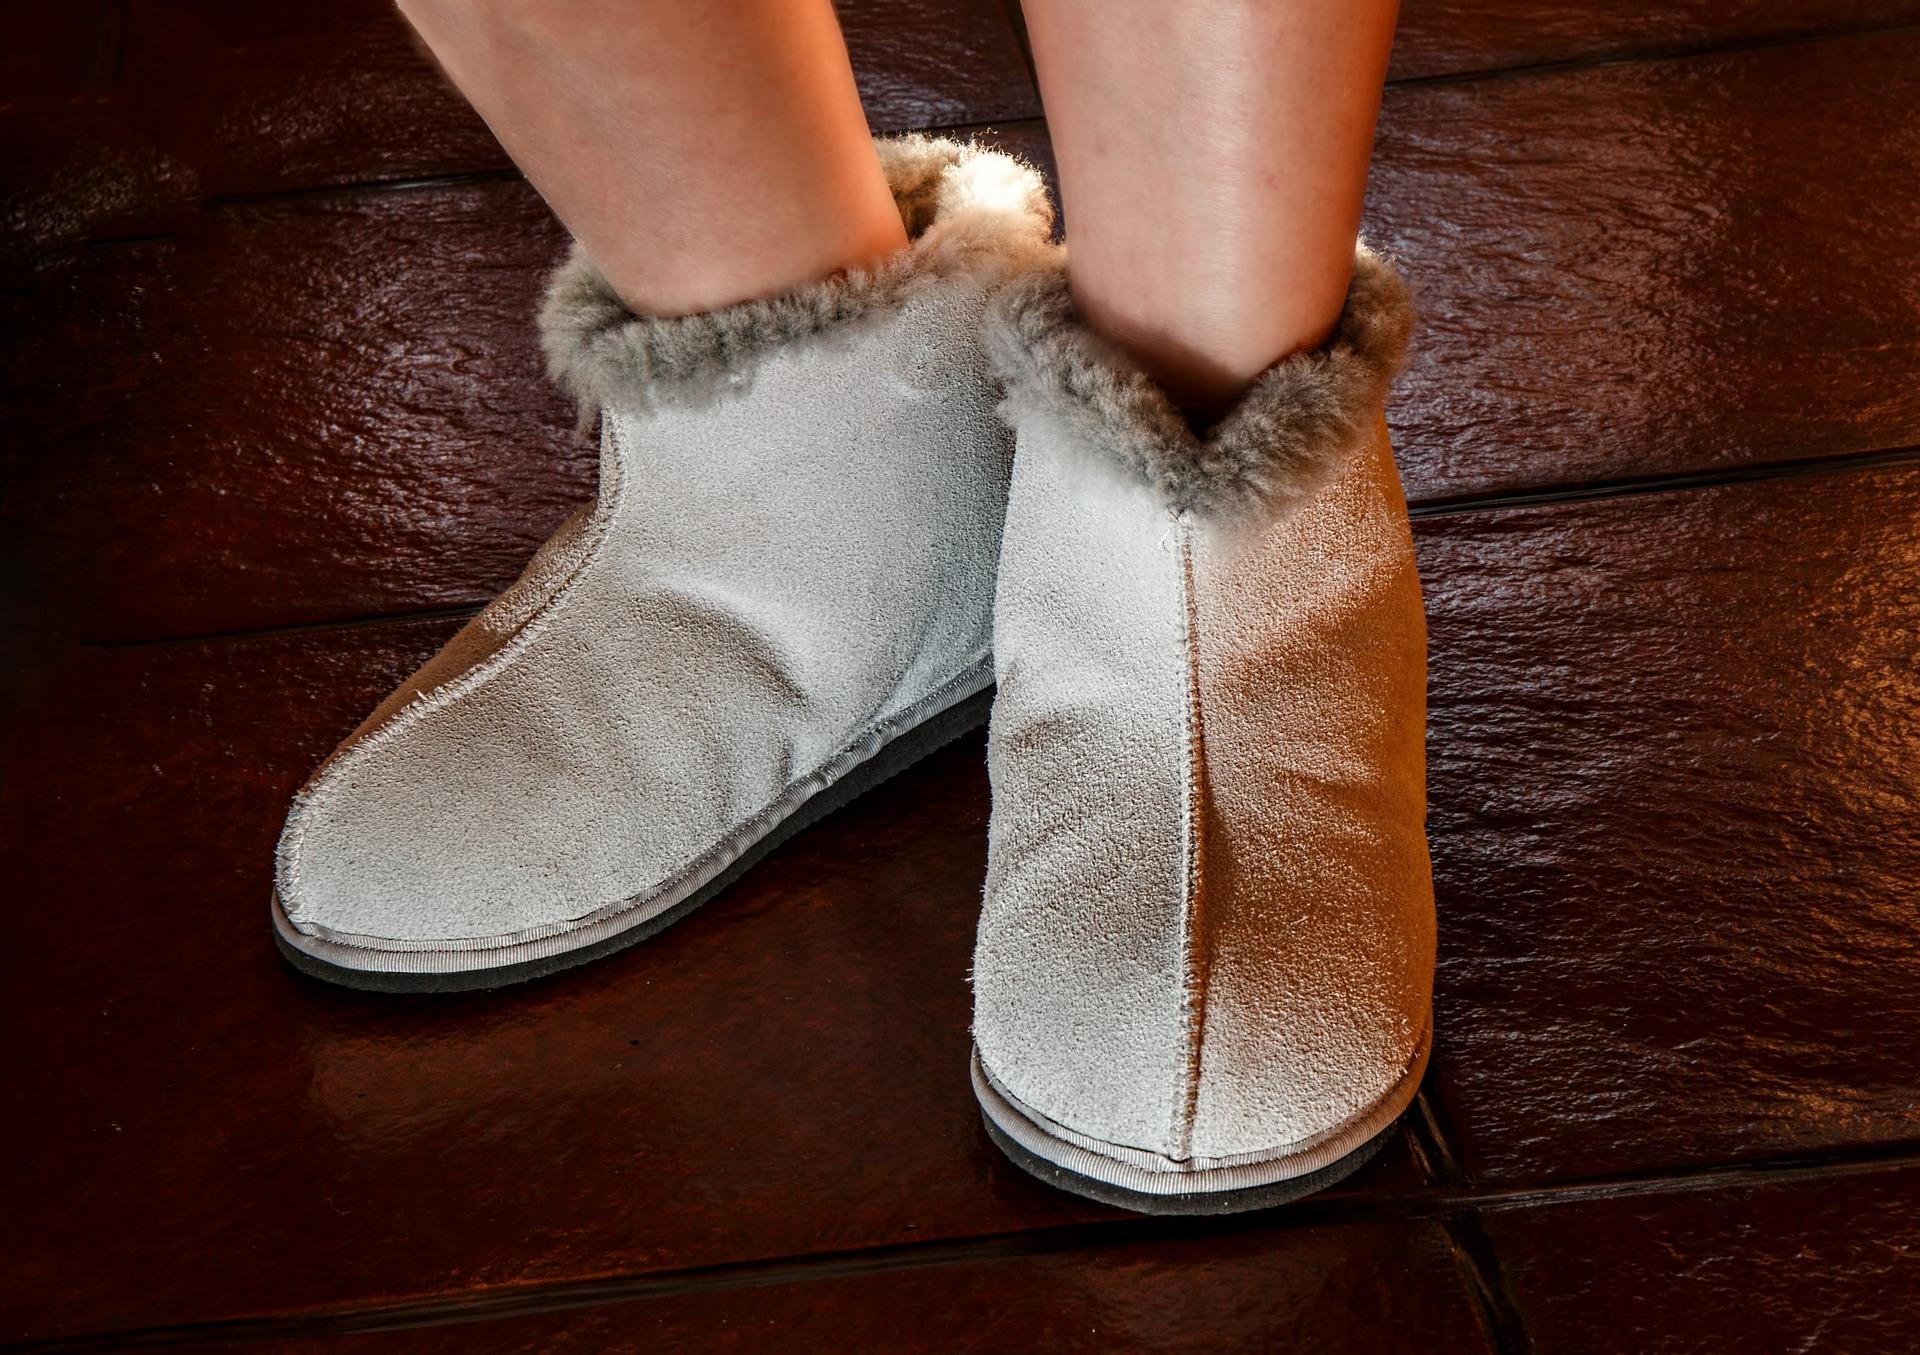 sheepskin-slippers-444181_1920